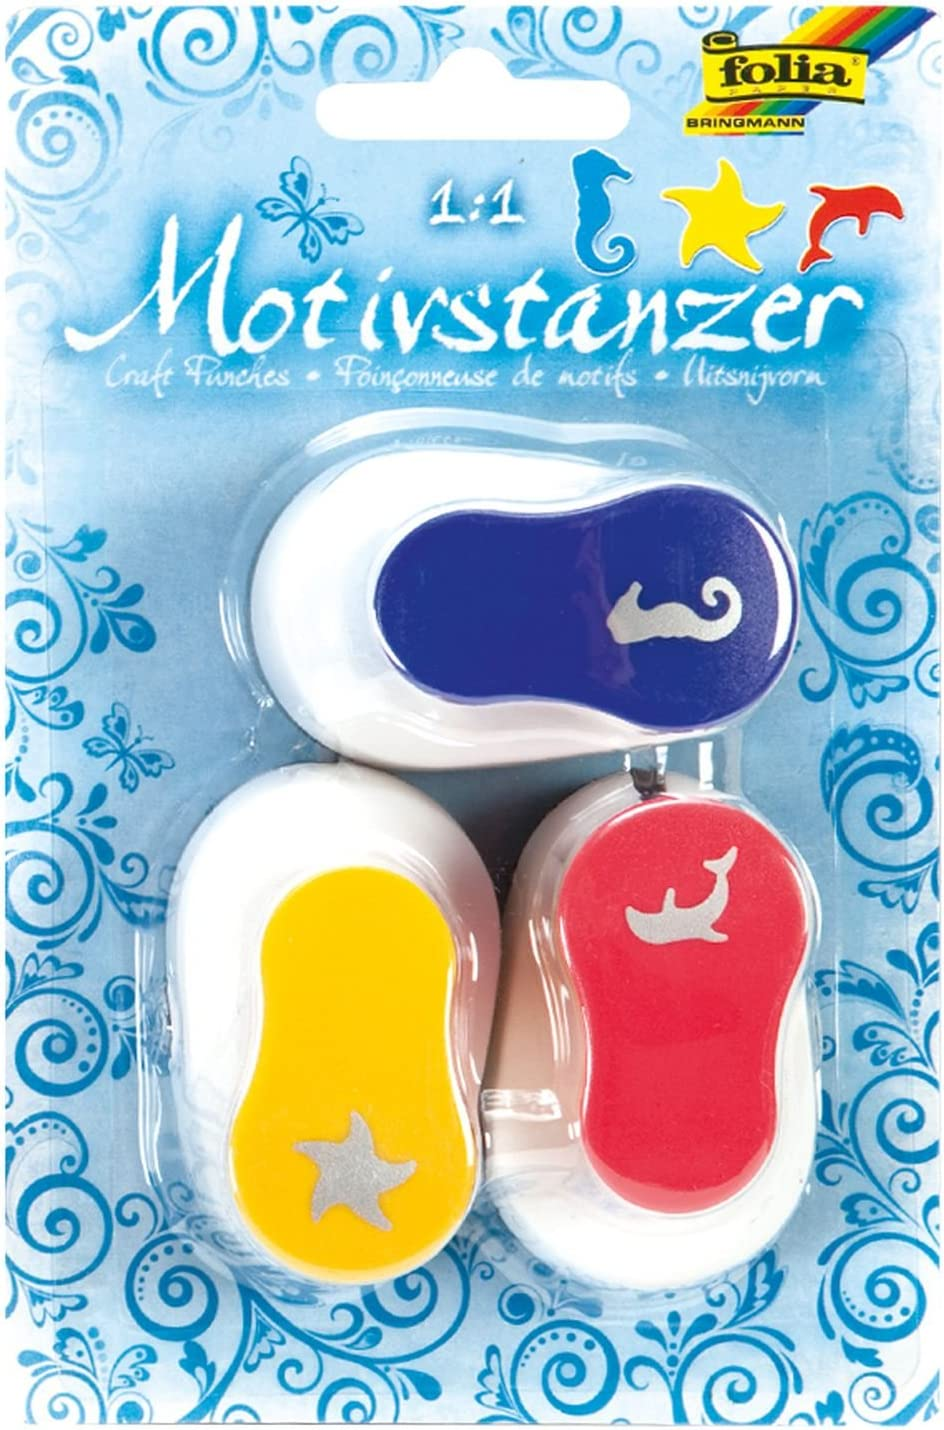 *Motivstanzer Luftballon ca.7,5 cm Motivlocher Stanzer Hebelstanzer Basteln DYI